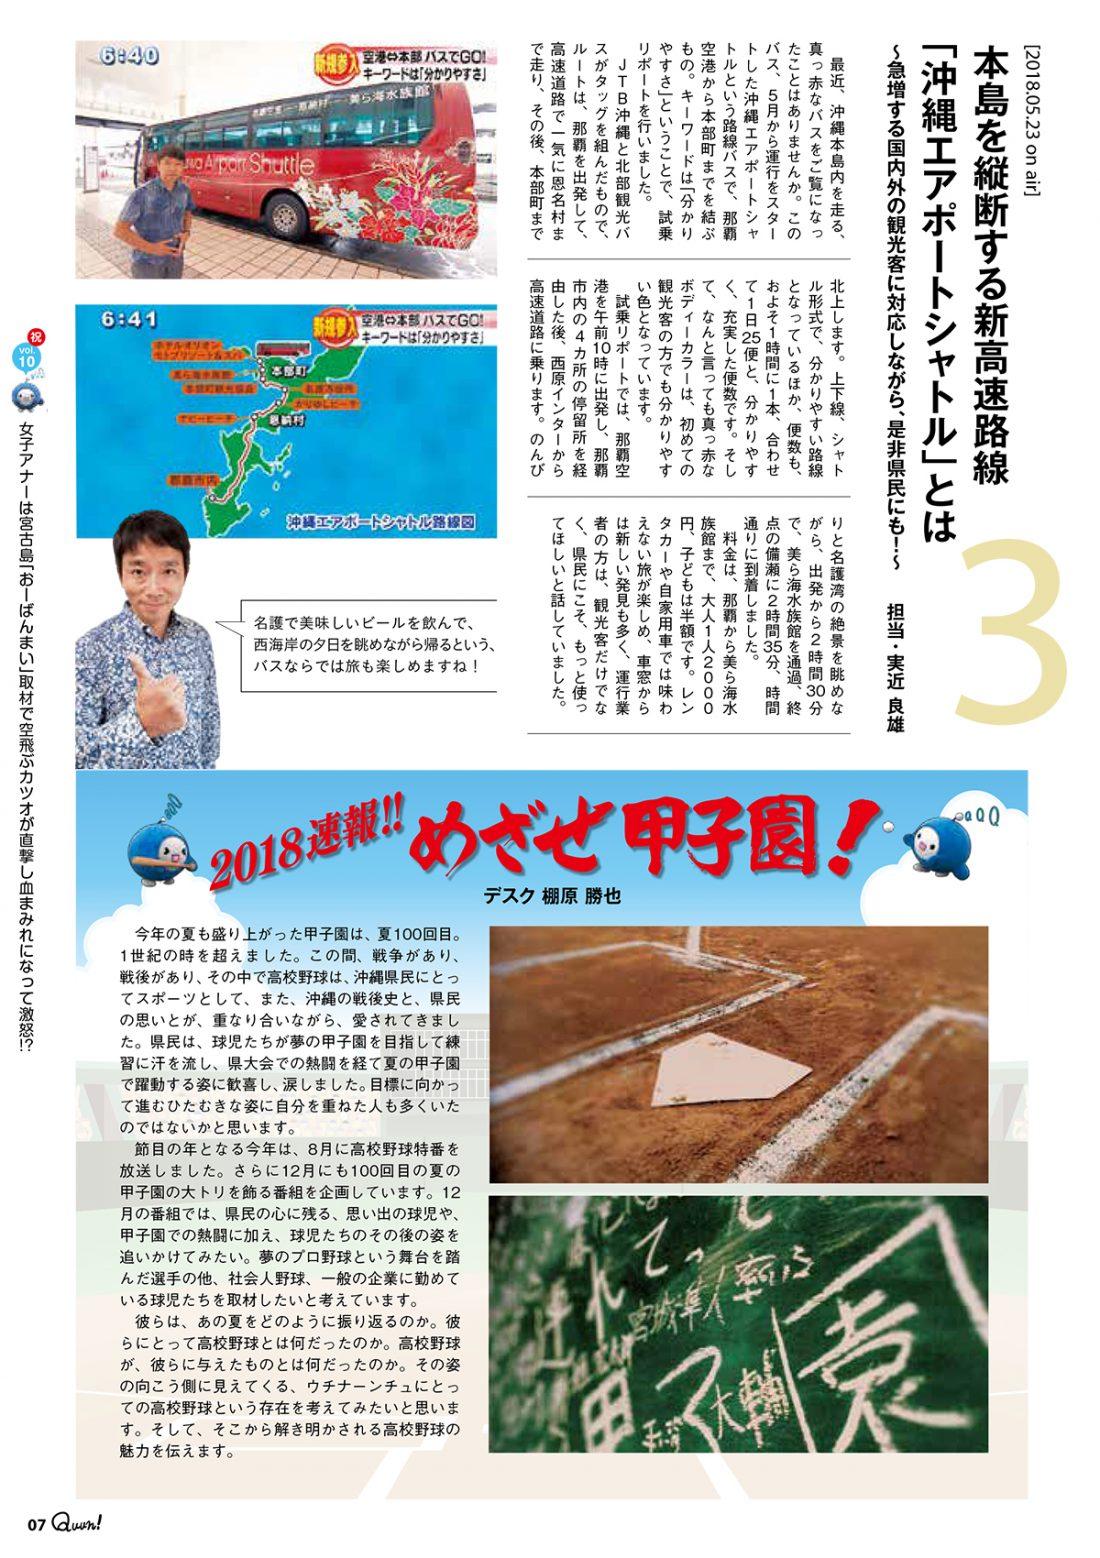 https://www.qab.co.jp/qgoro/wp-content/uploads/quun_1009-1100x1558.jpg